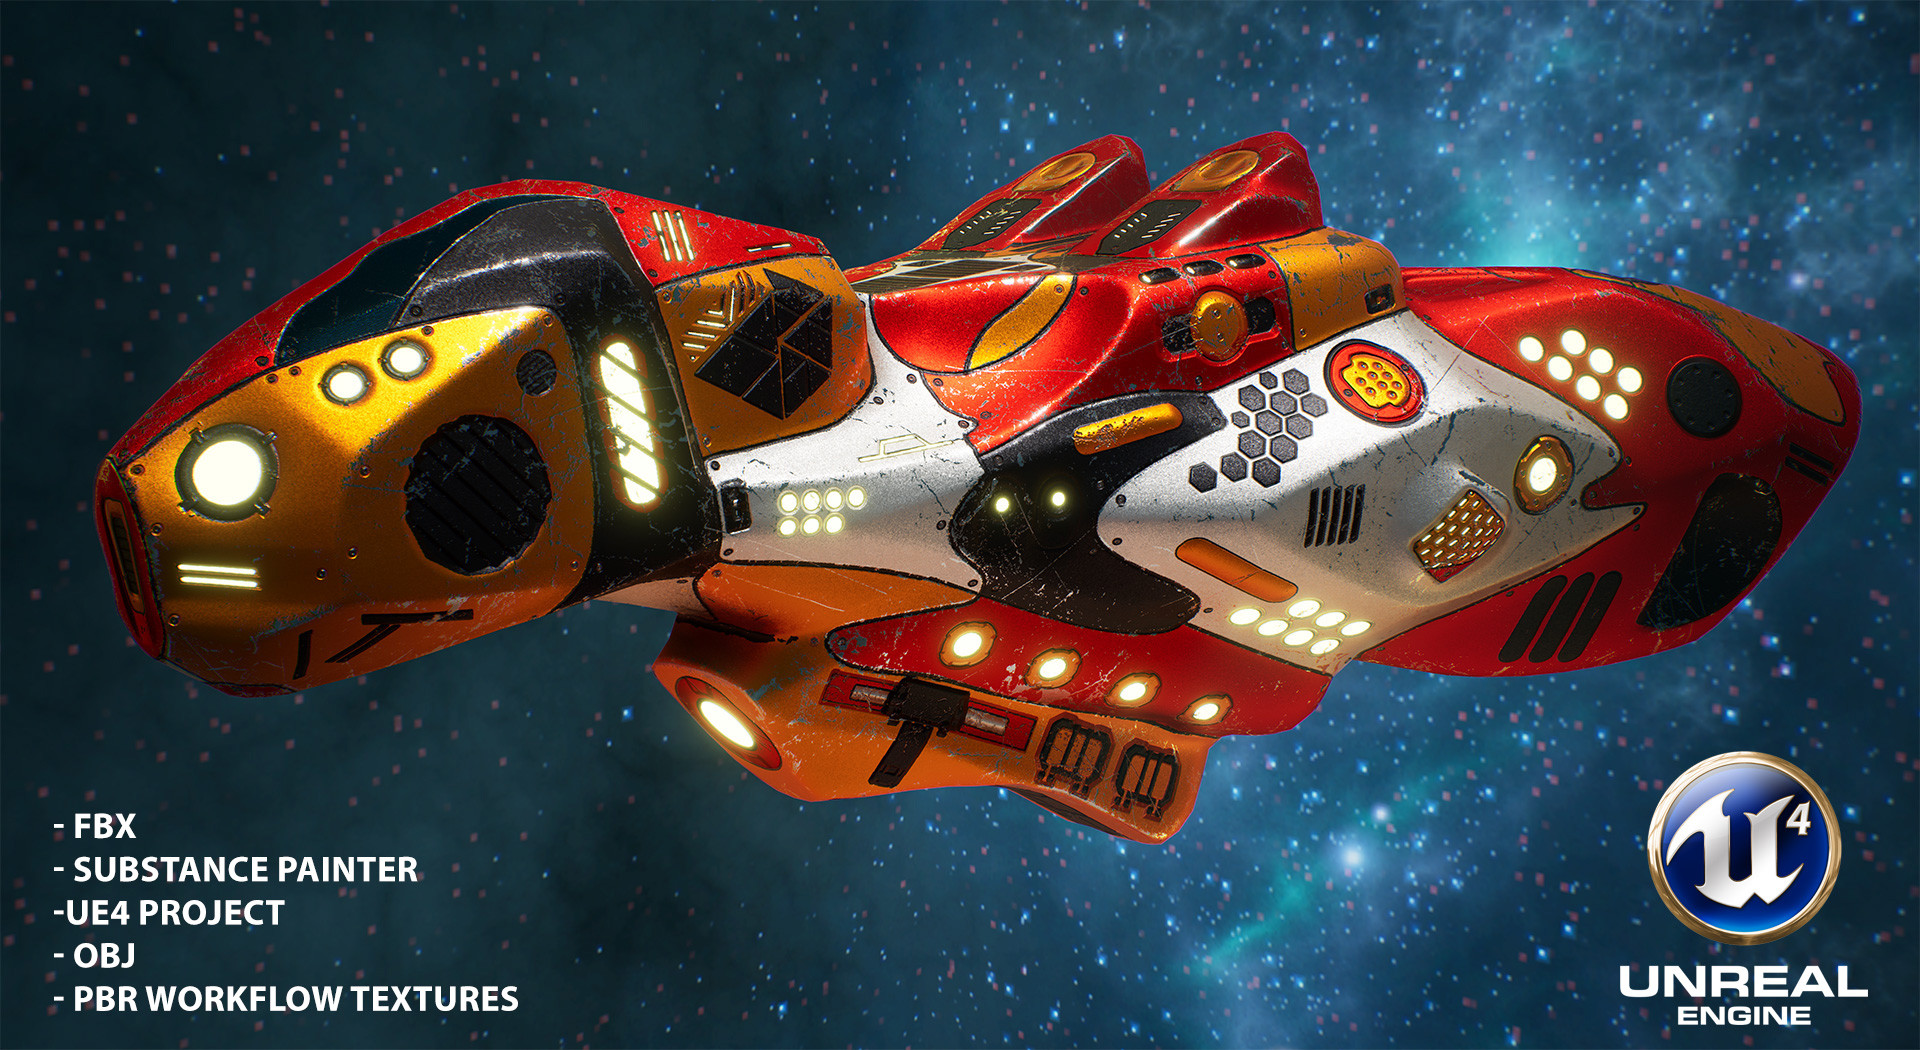 The art of Andrew Krivulya (Charly) - Sci-fi spaceship r2qf8